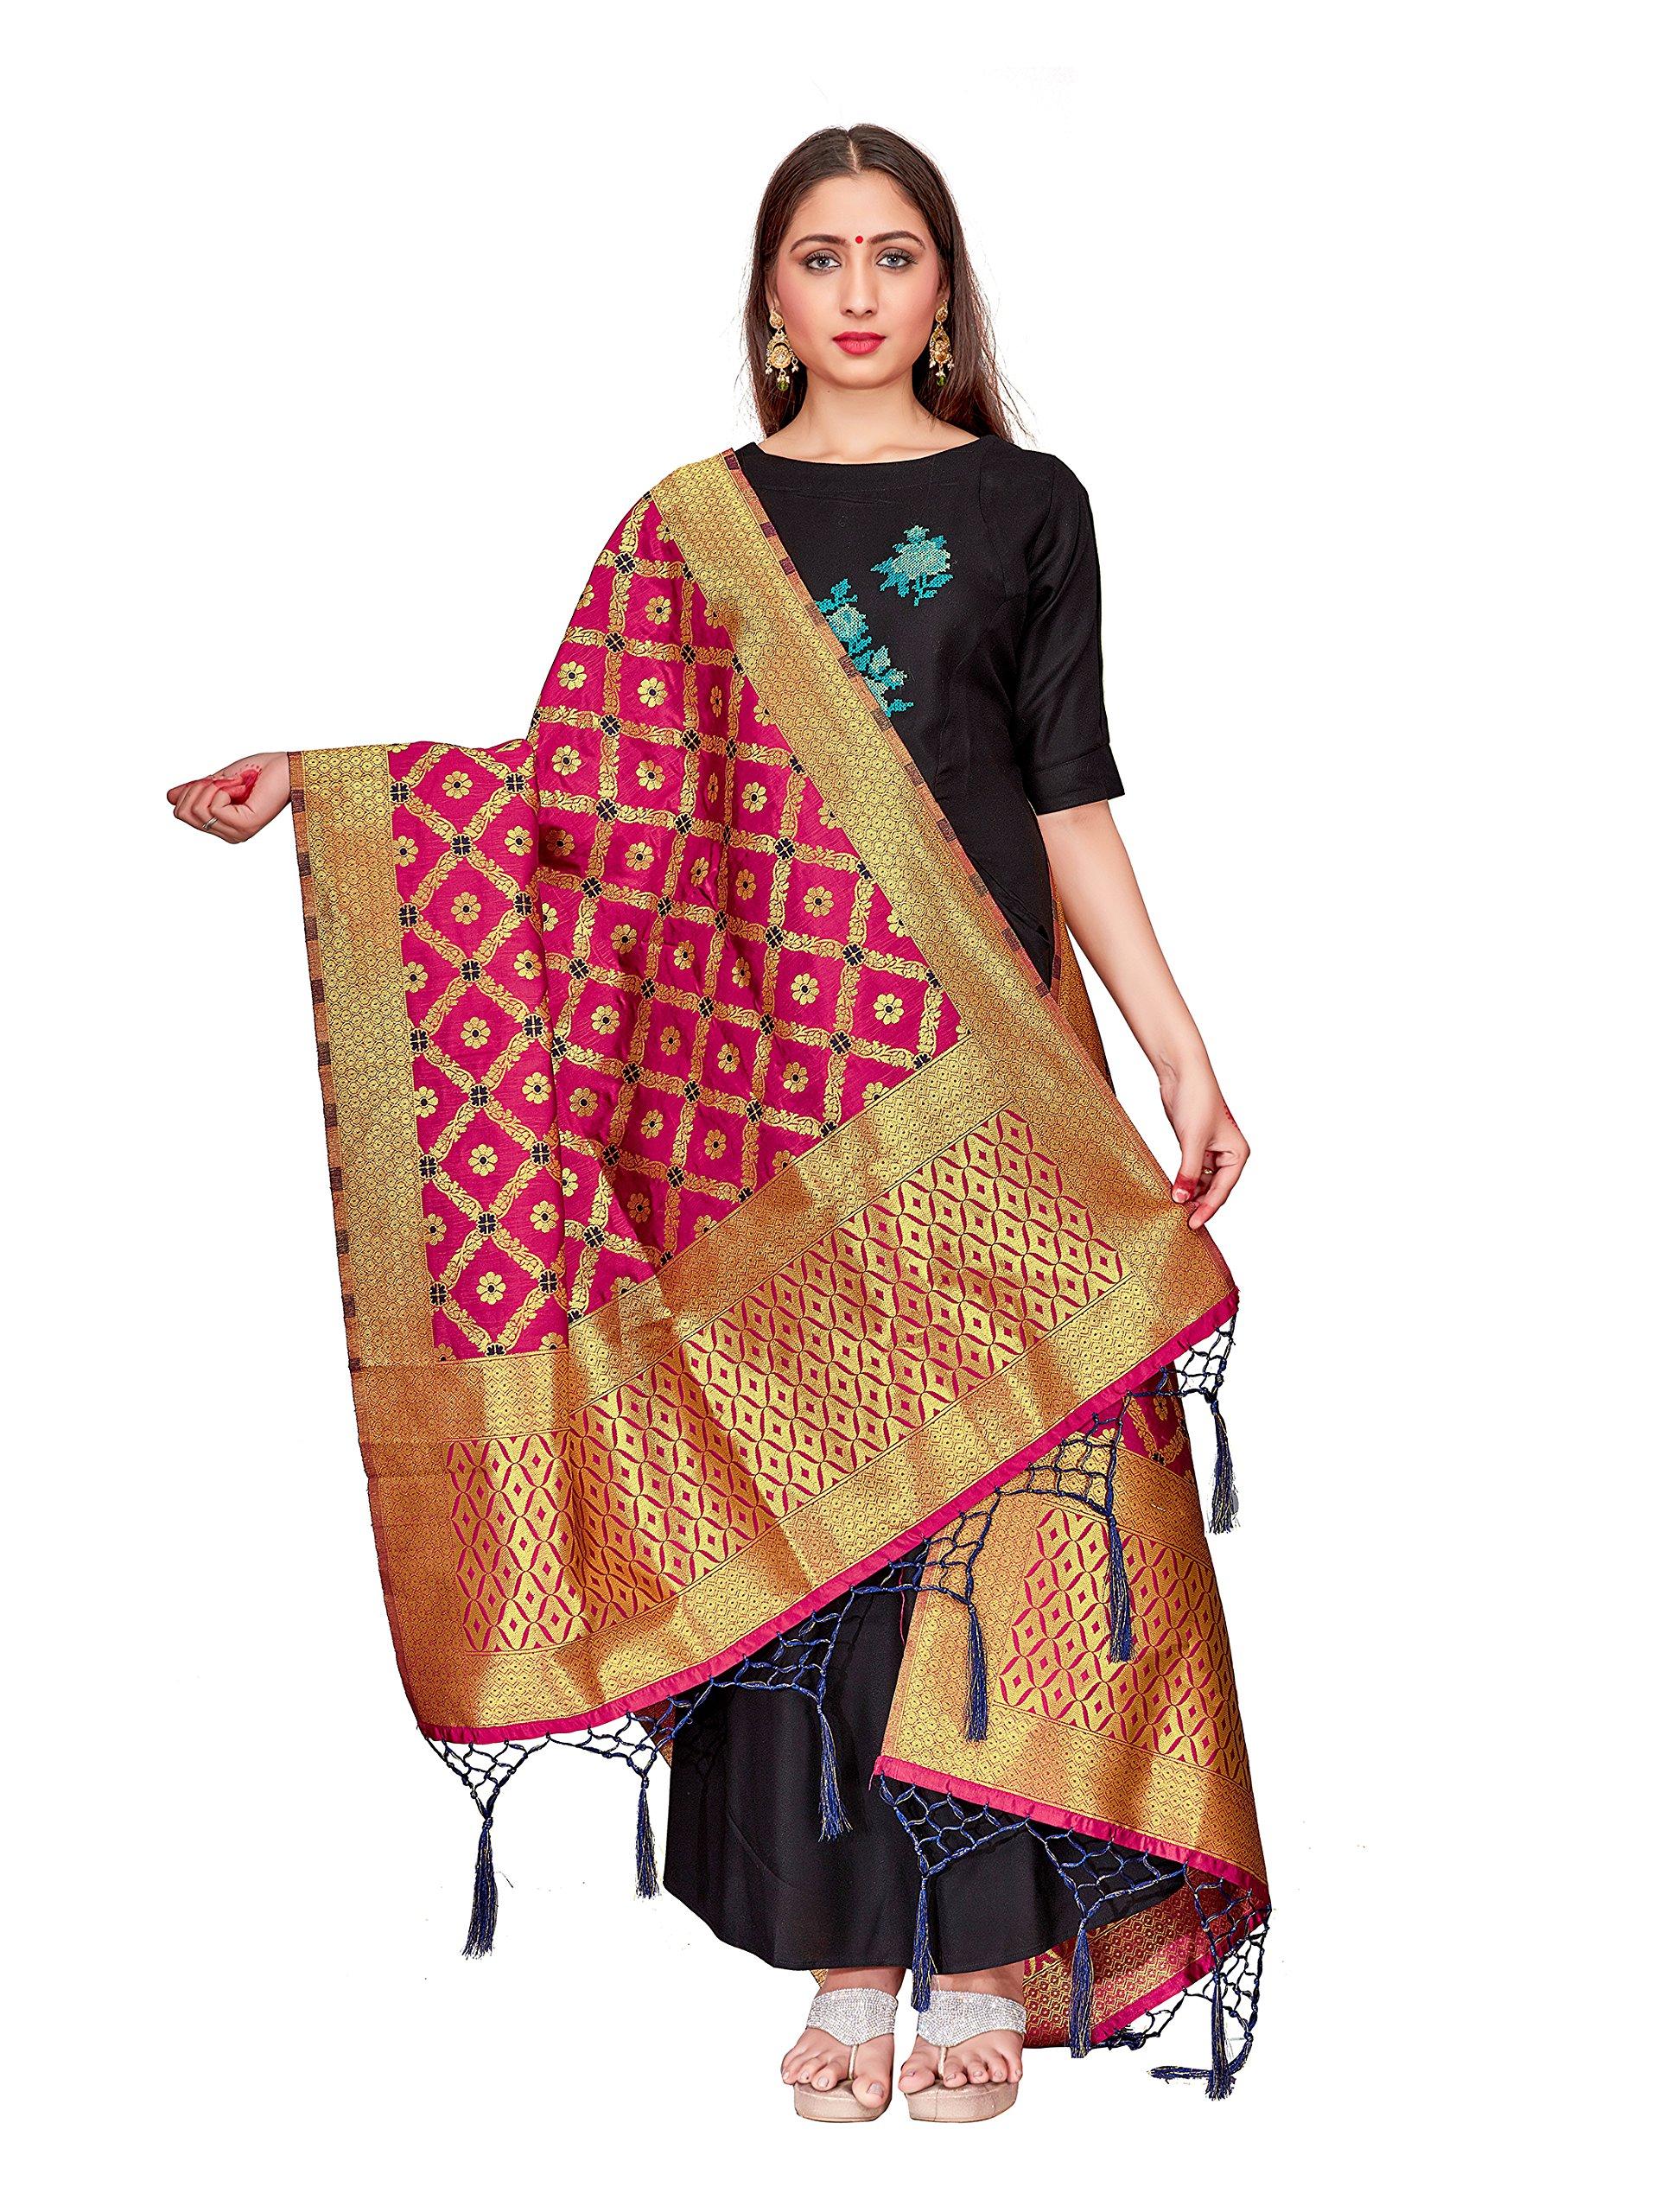 ELINA FASHION Women's Zari Work Indian Banarasi Art Silk Woven Only Dupatta for Dress Material & Salwar Suit